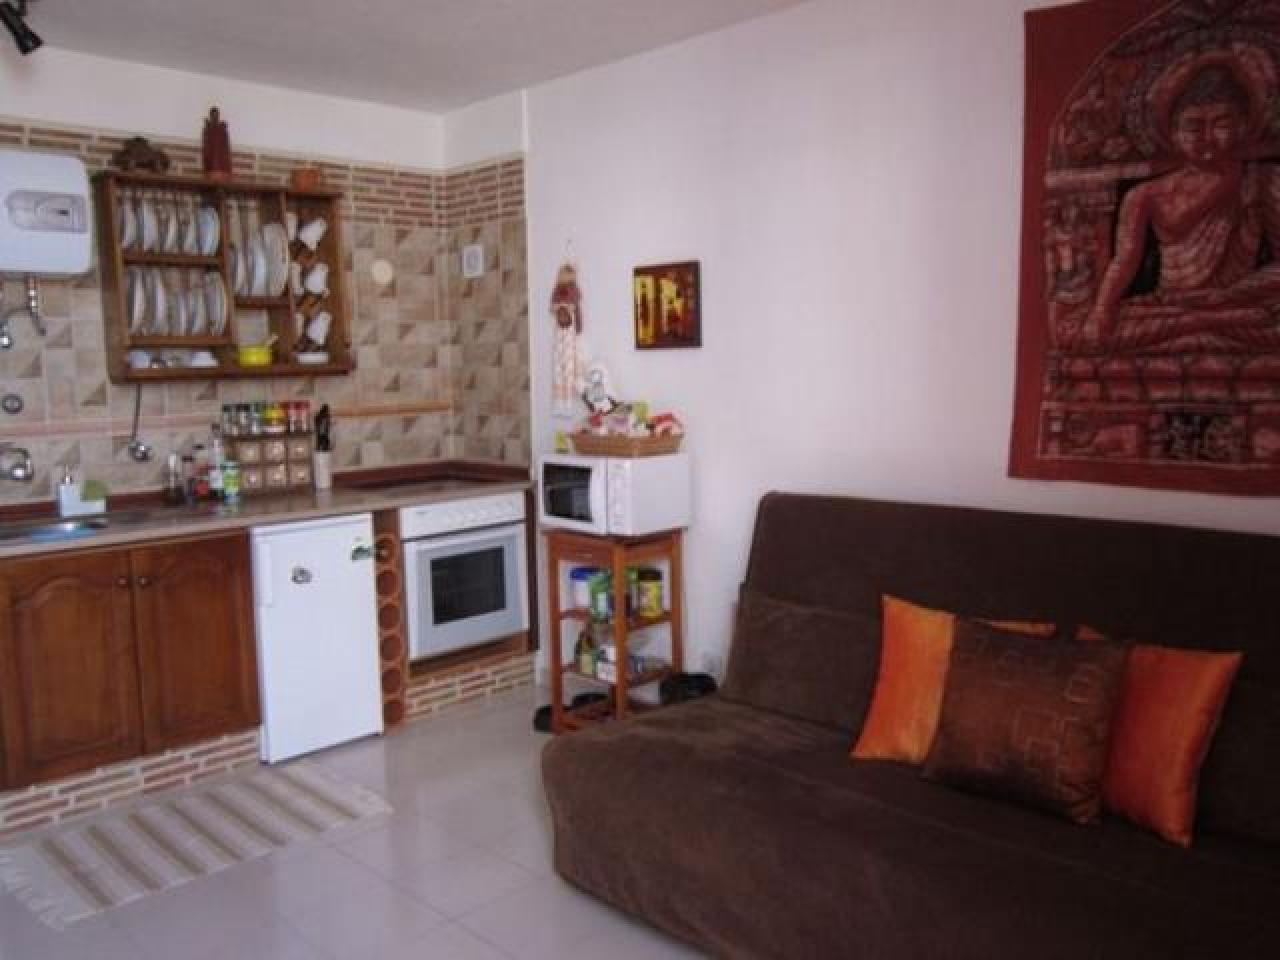 Apartment in Tenerife to rent - 4